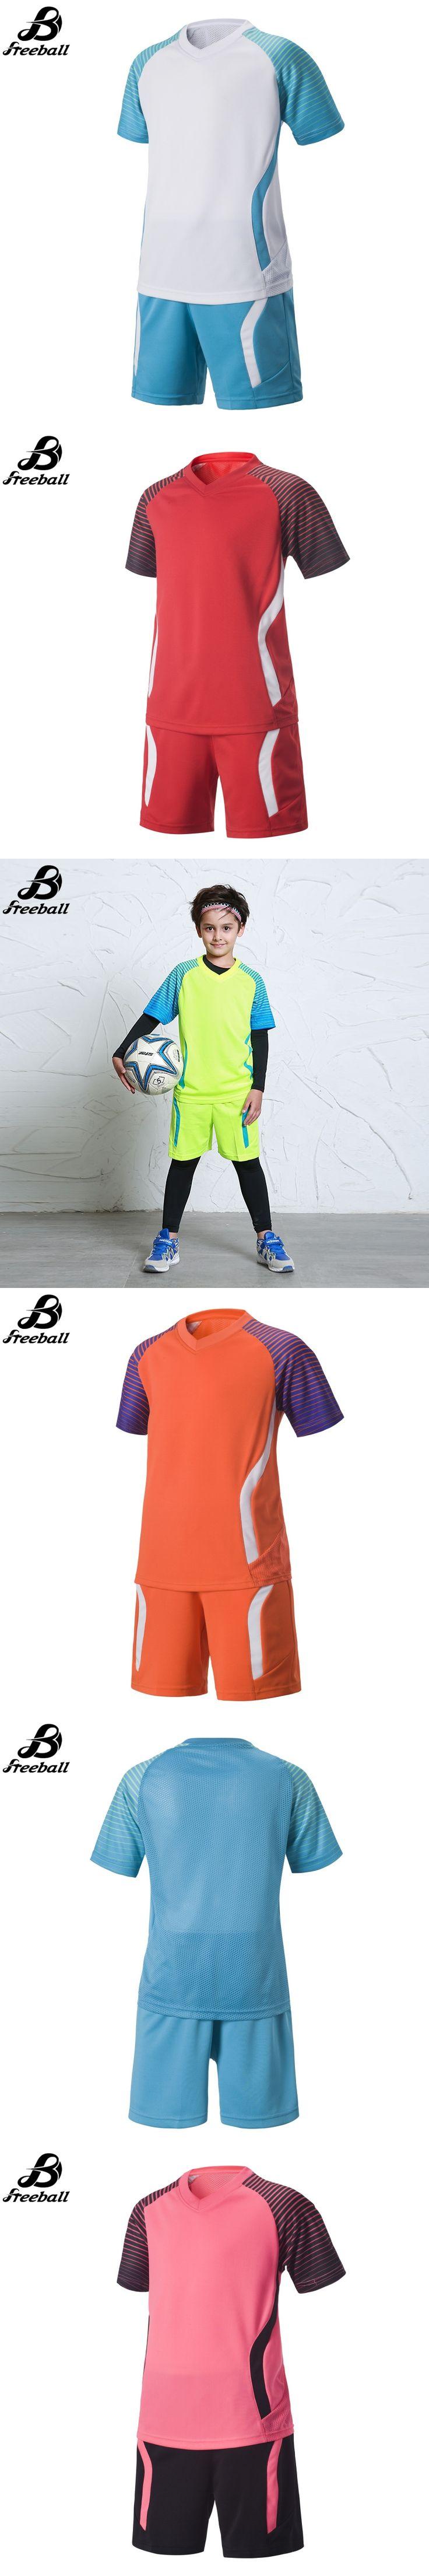 2016/17 boys football uniforms thai quality soccer jerseys for kids soccer kits new arrival